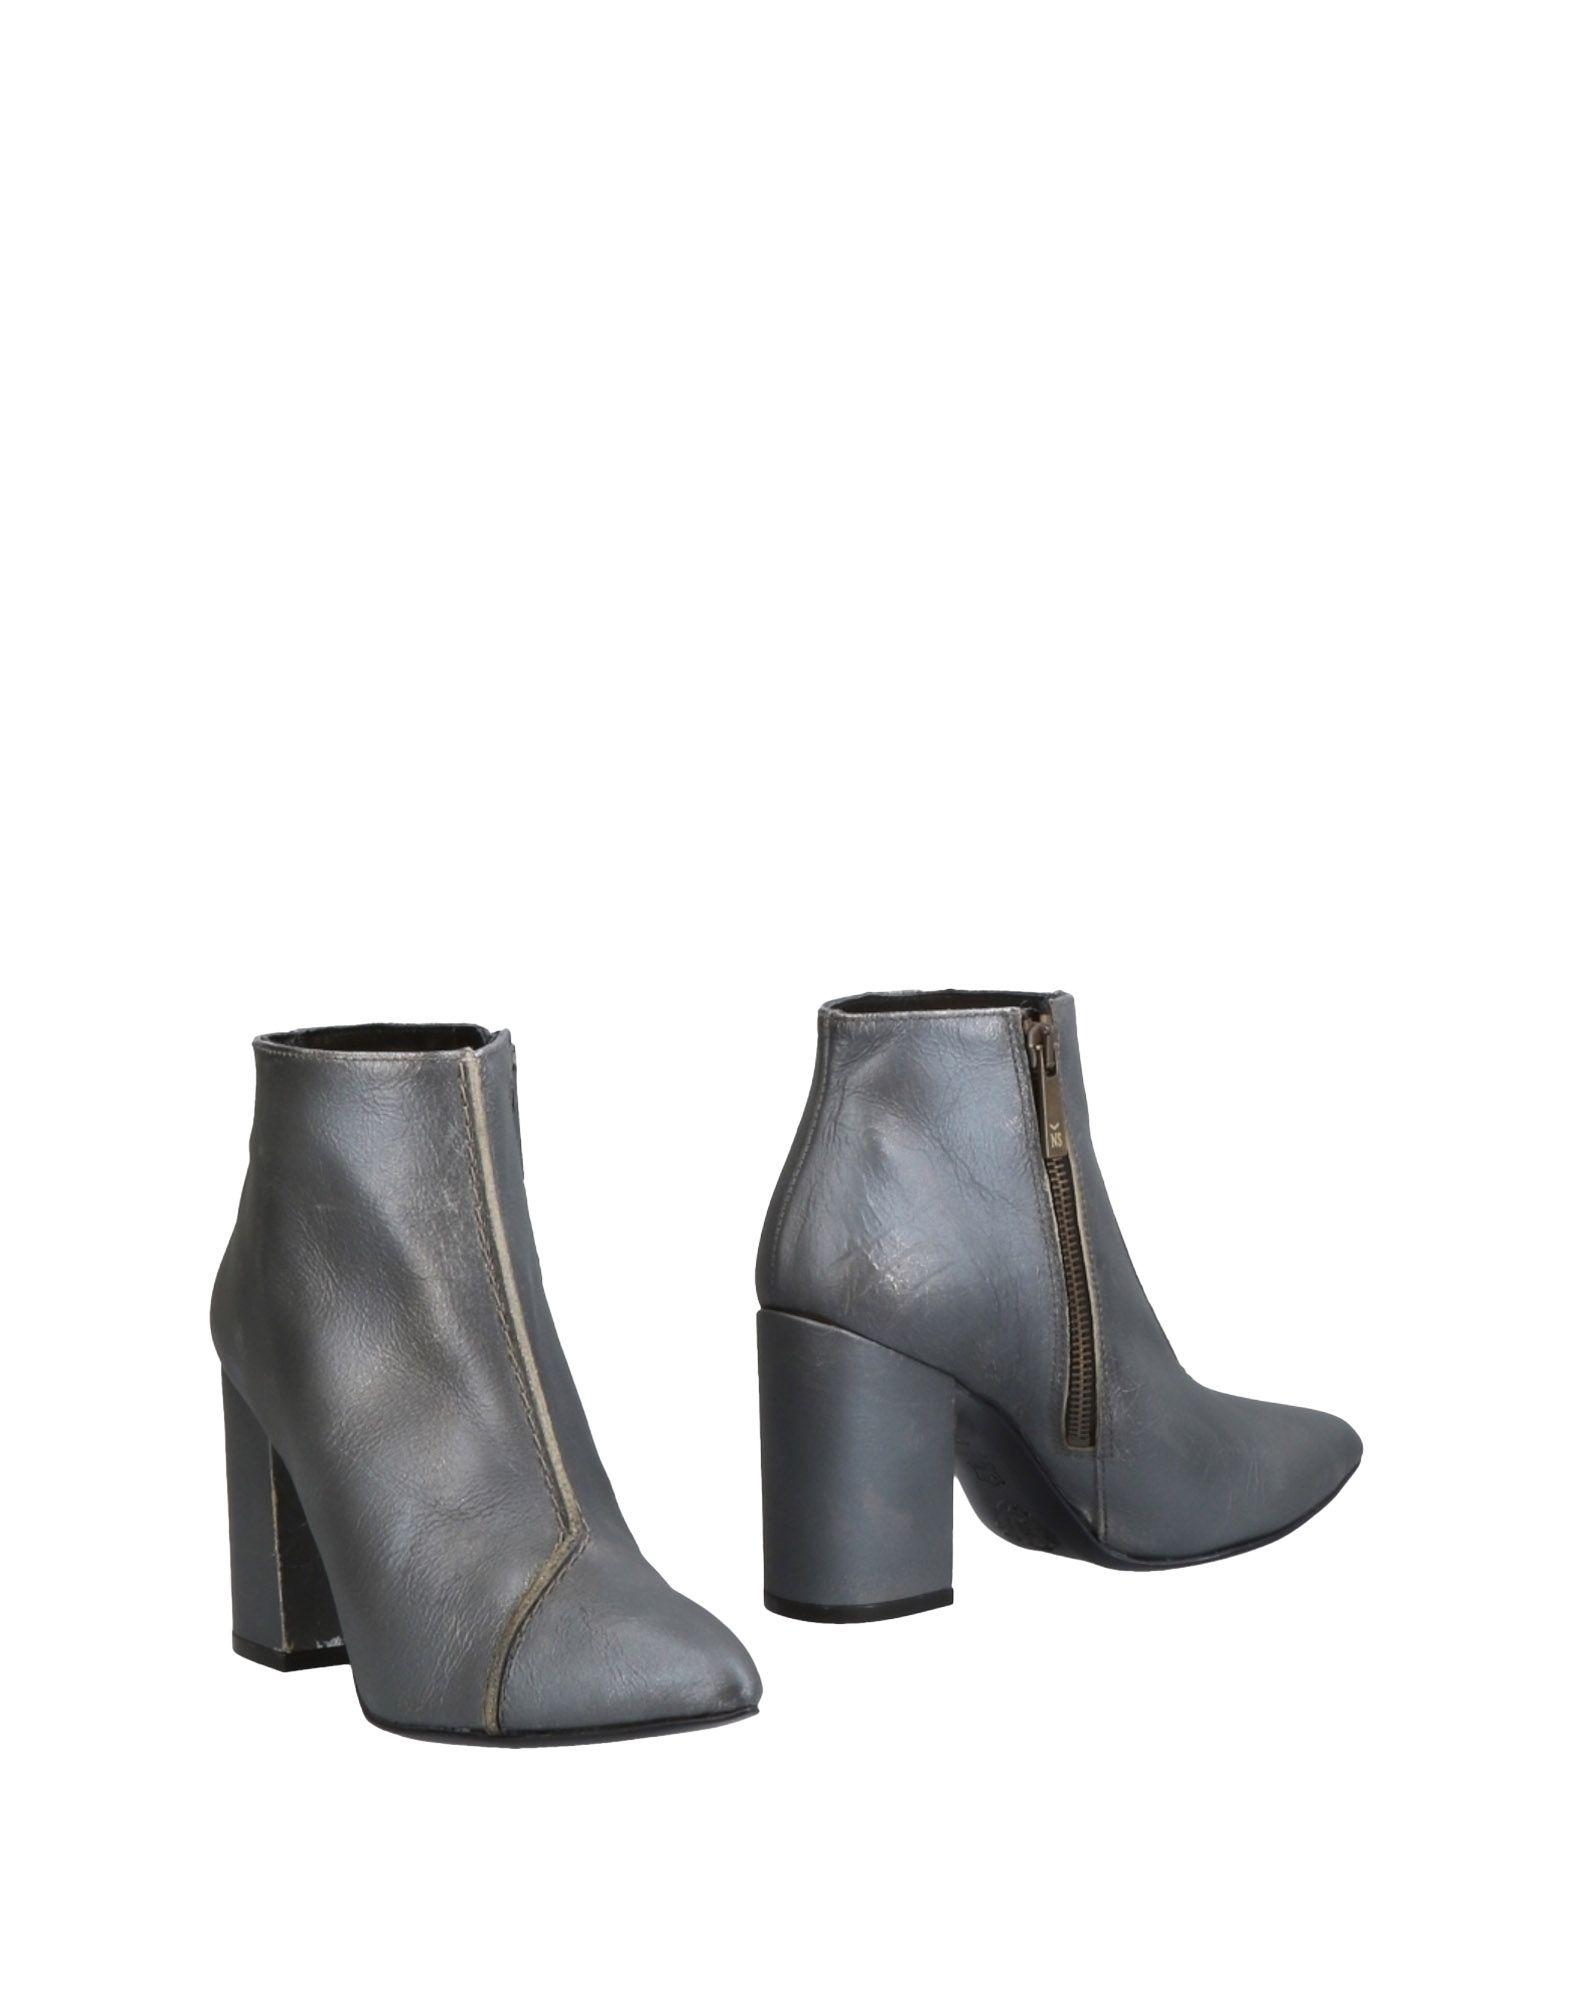 Nostrasantissima Ankle Boot - - - Women Nostrasantissima Ankle Boots online on  United Kingdom - 11458880OB 18b74c